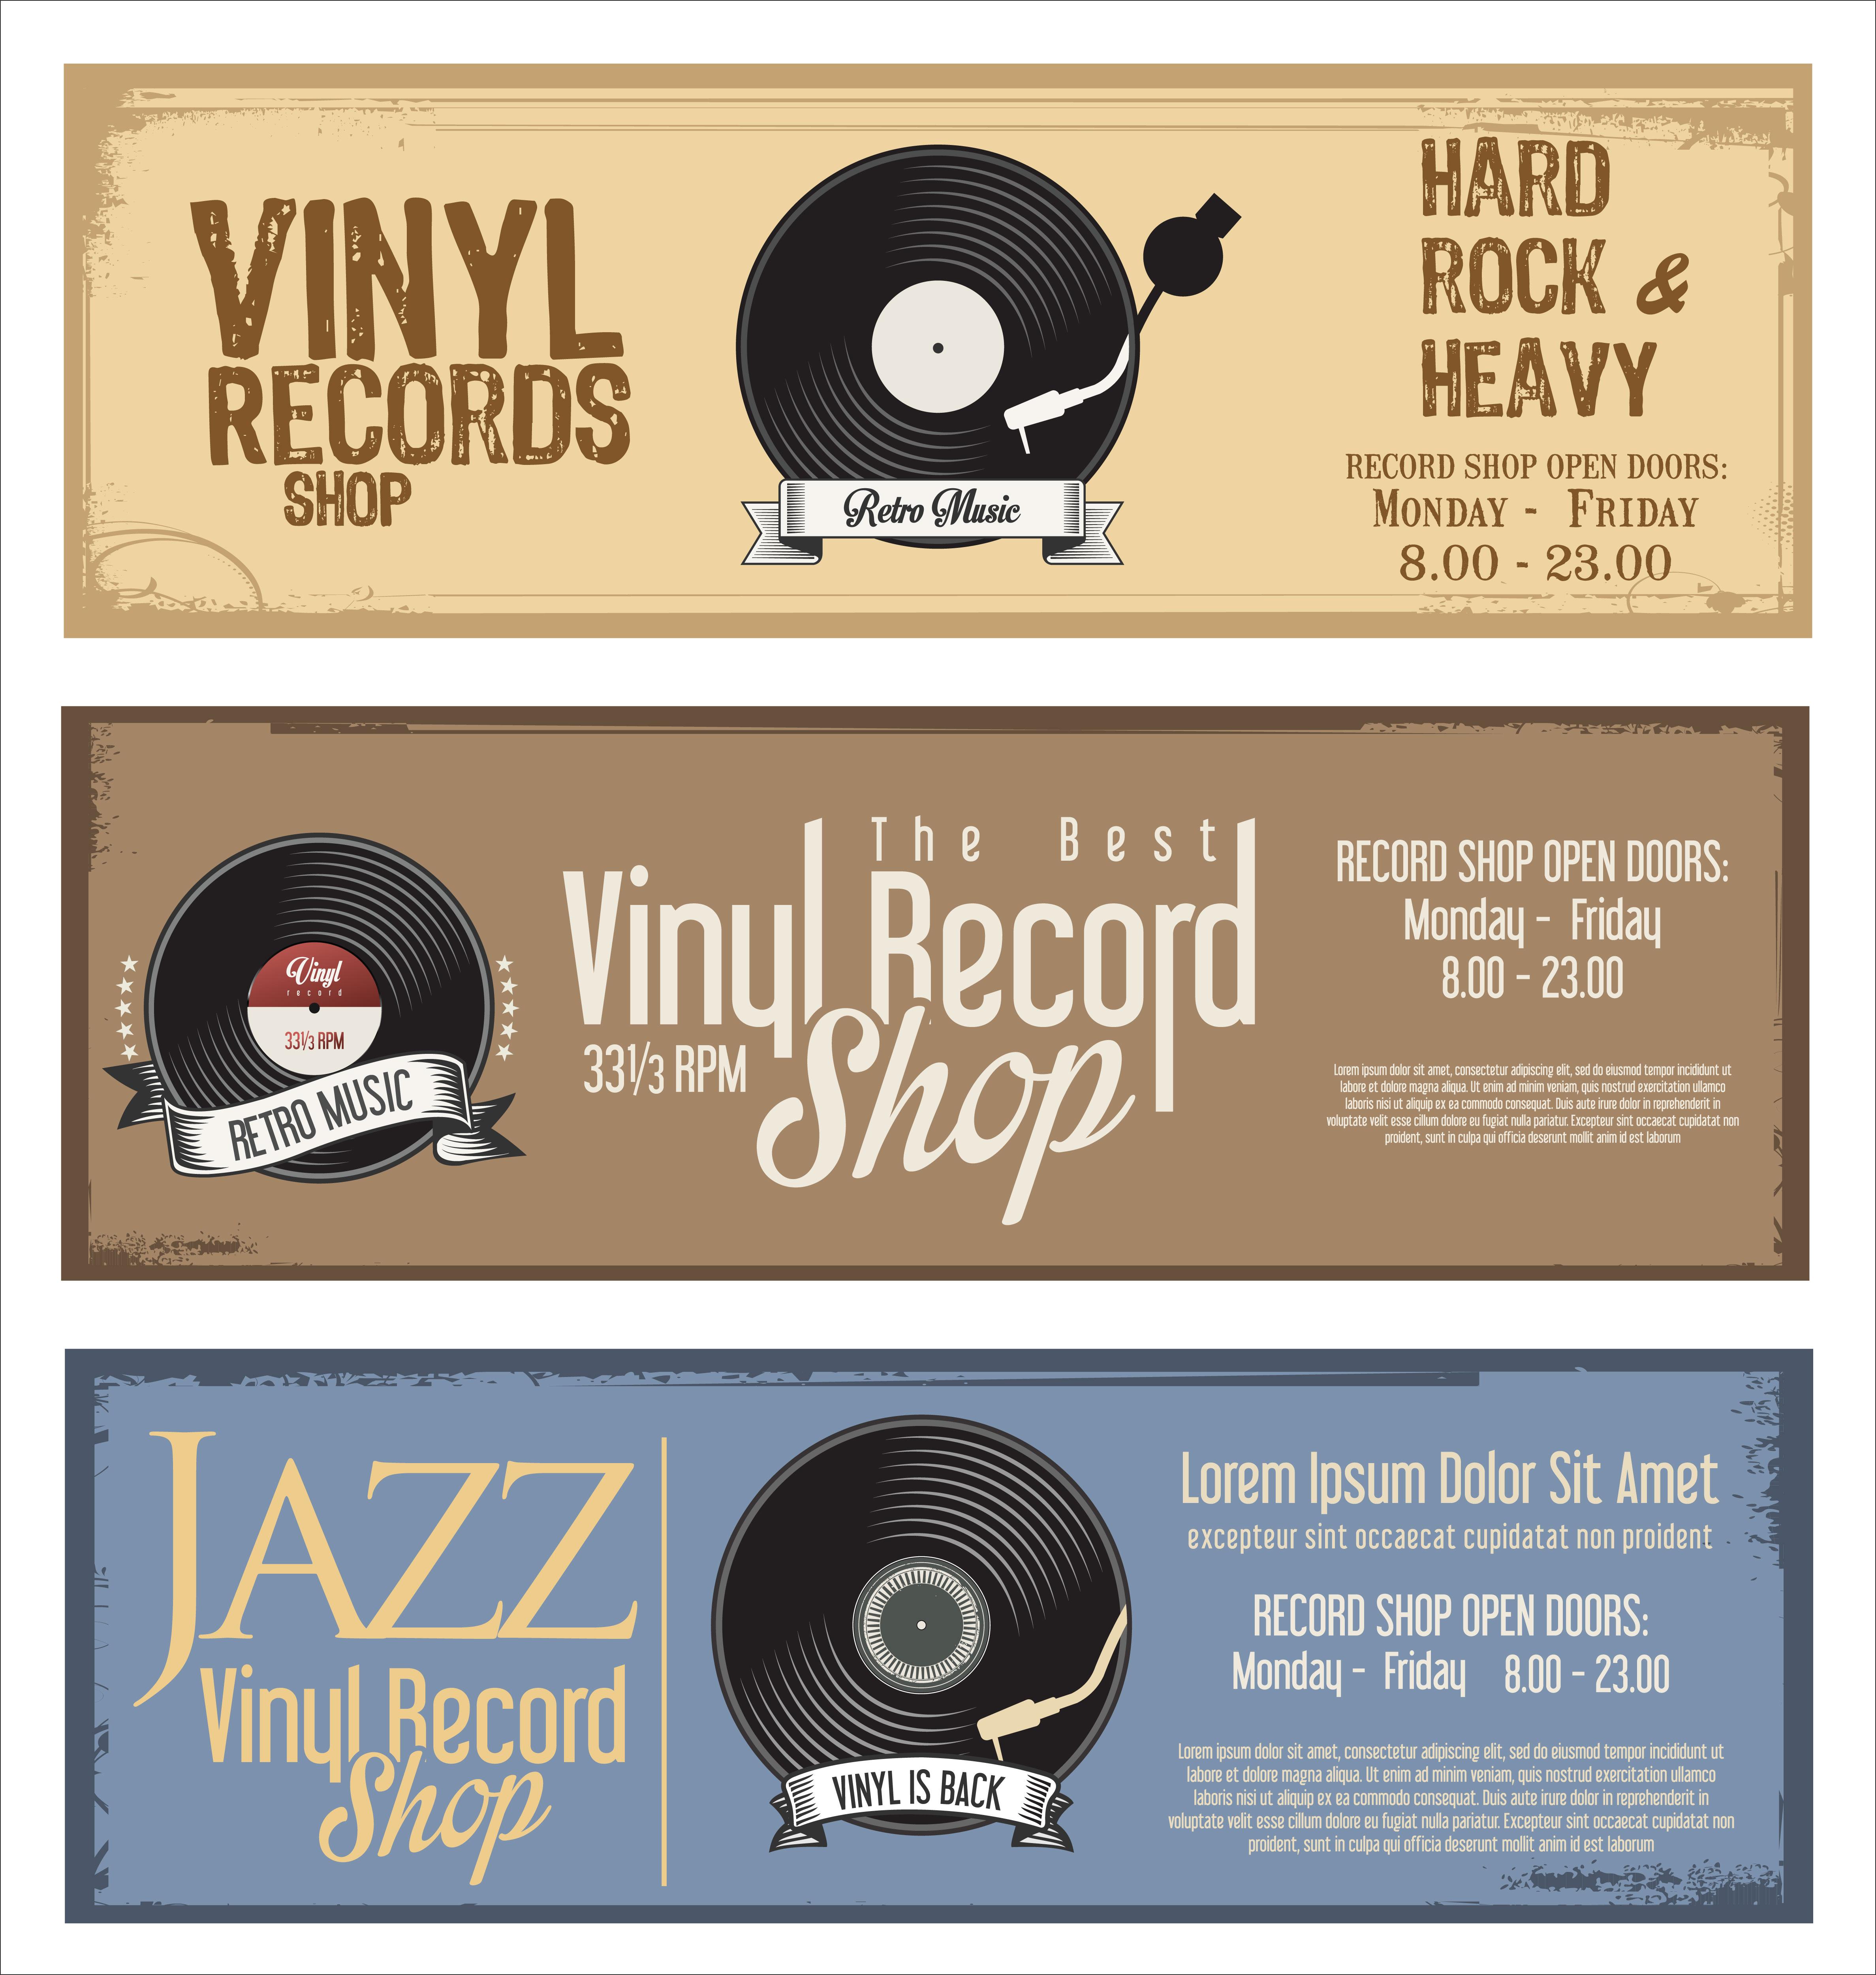 Vinyl record shop retro grunge banner - Download Free Vector Art